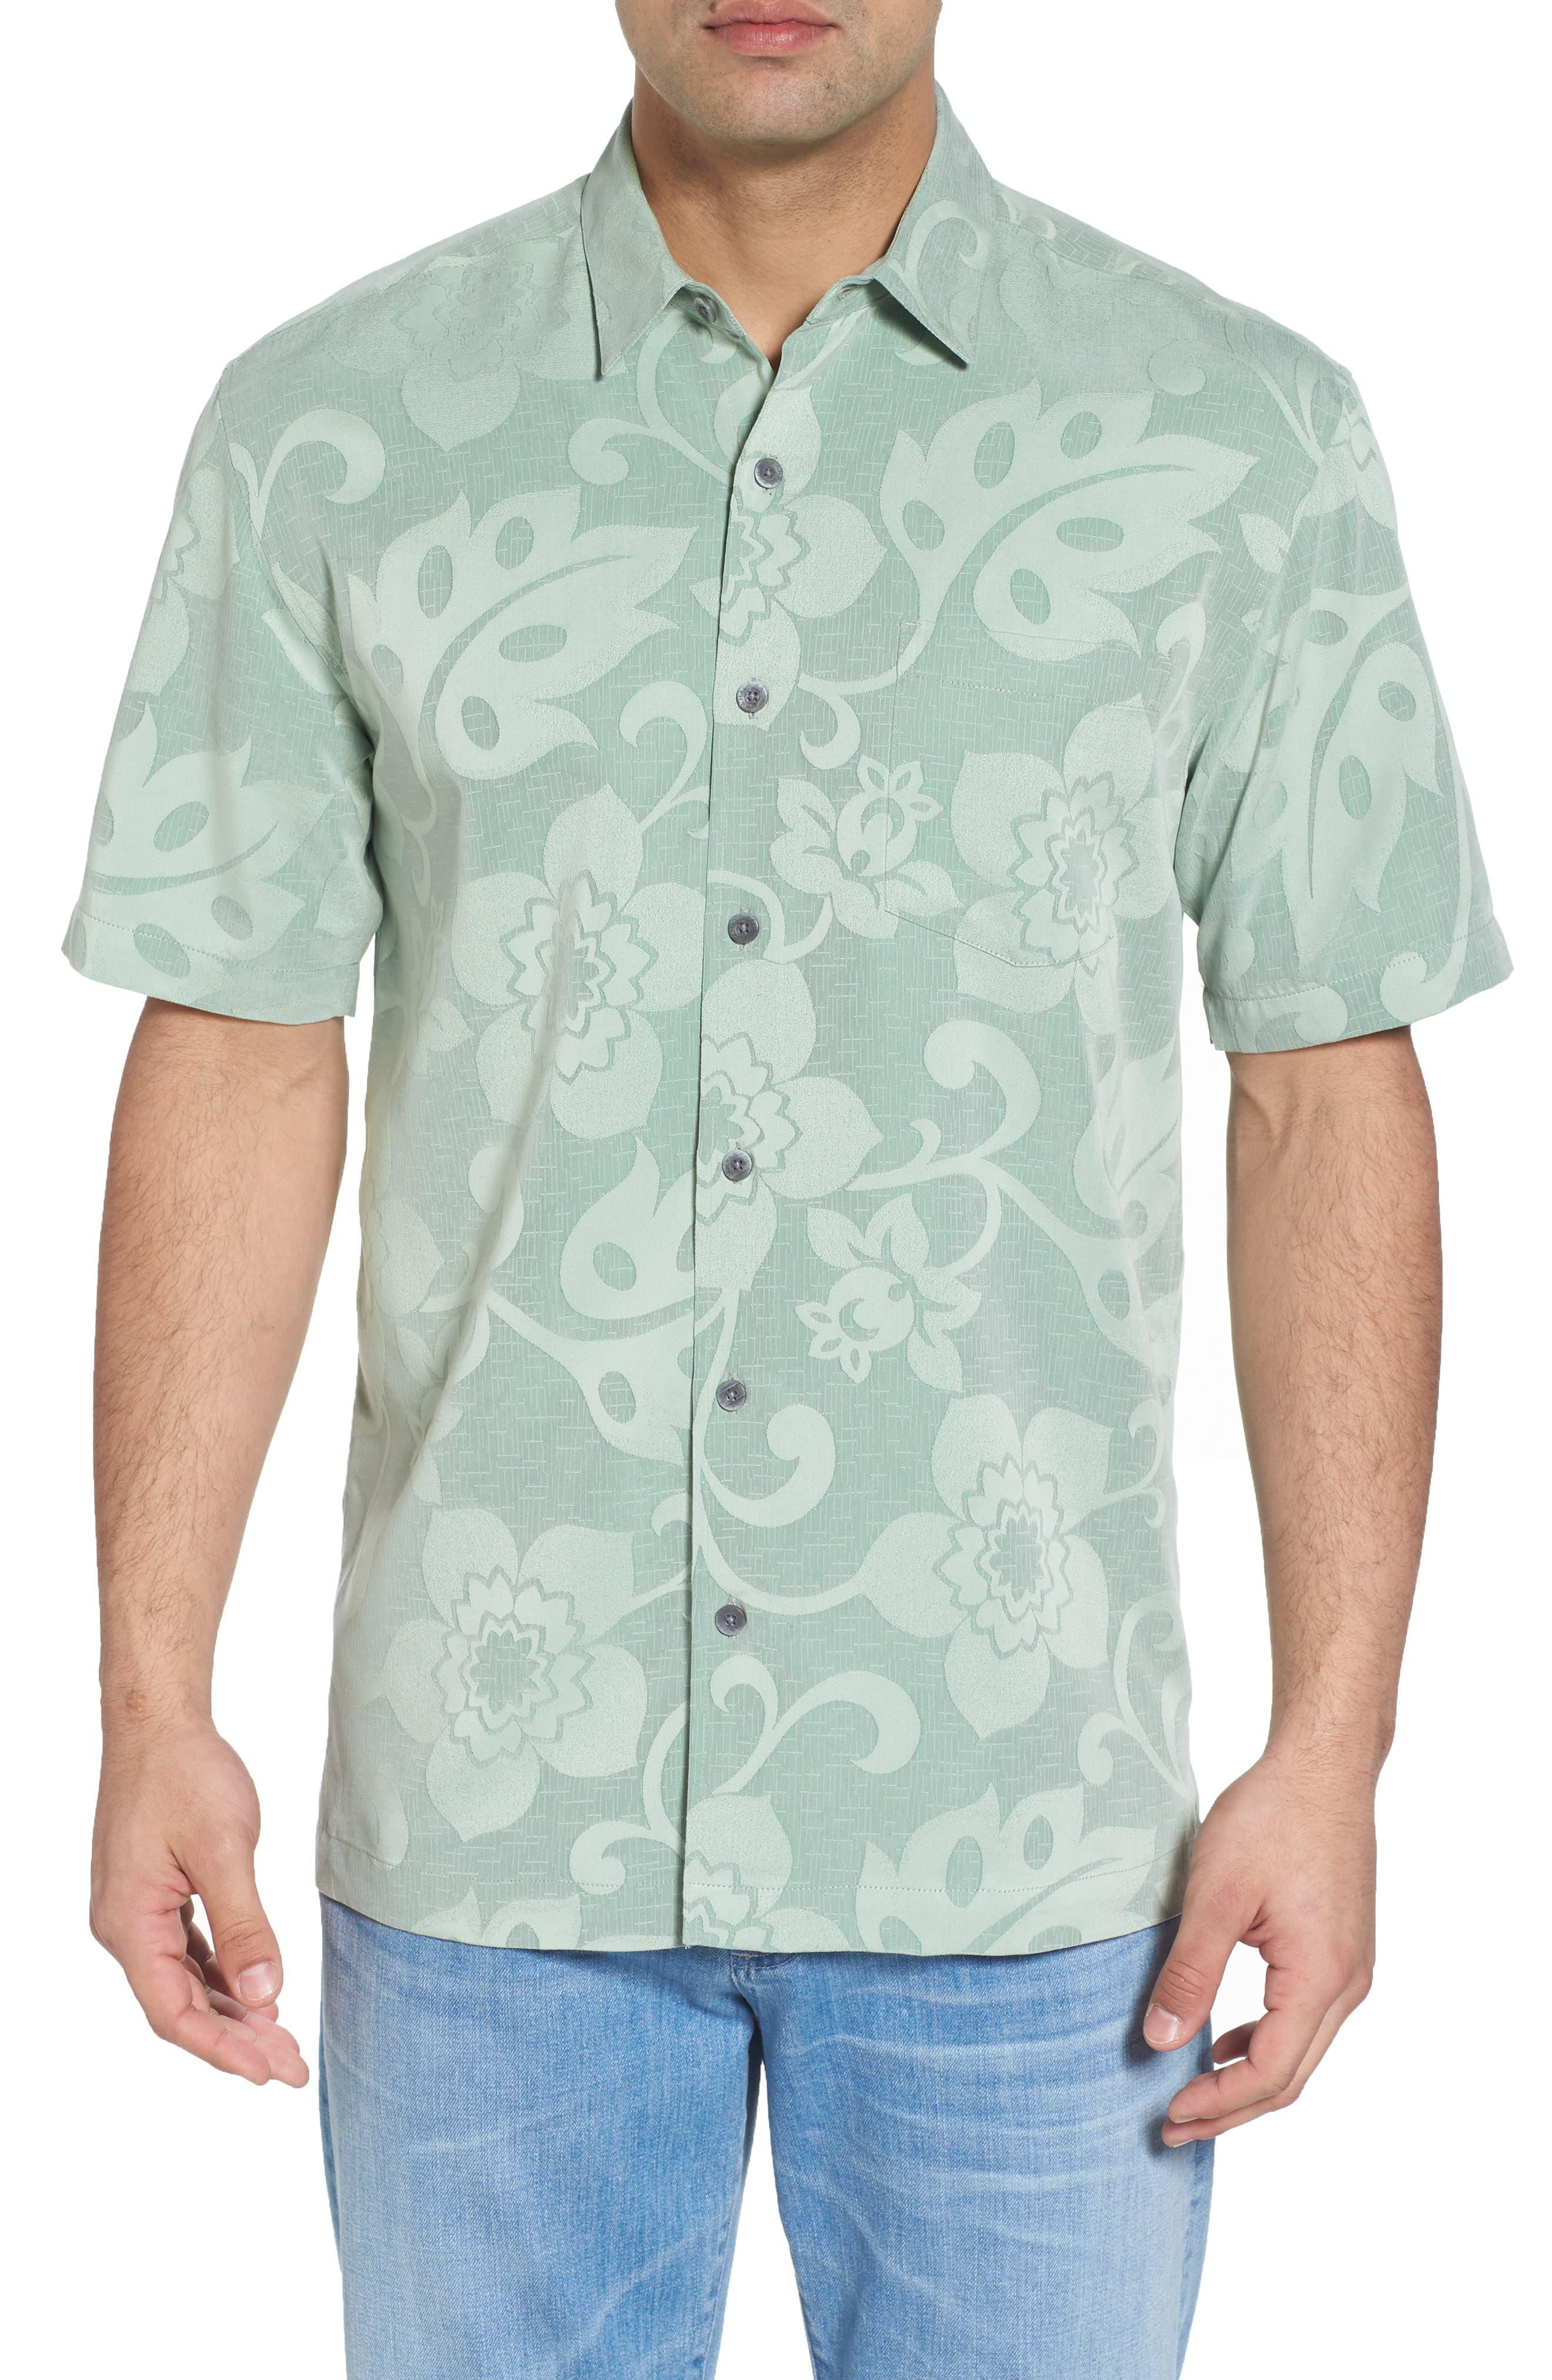 Kalawai Relaxed Fit Camp Shirt,                         Main,                         color, Green